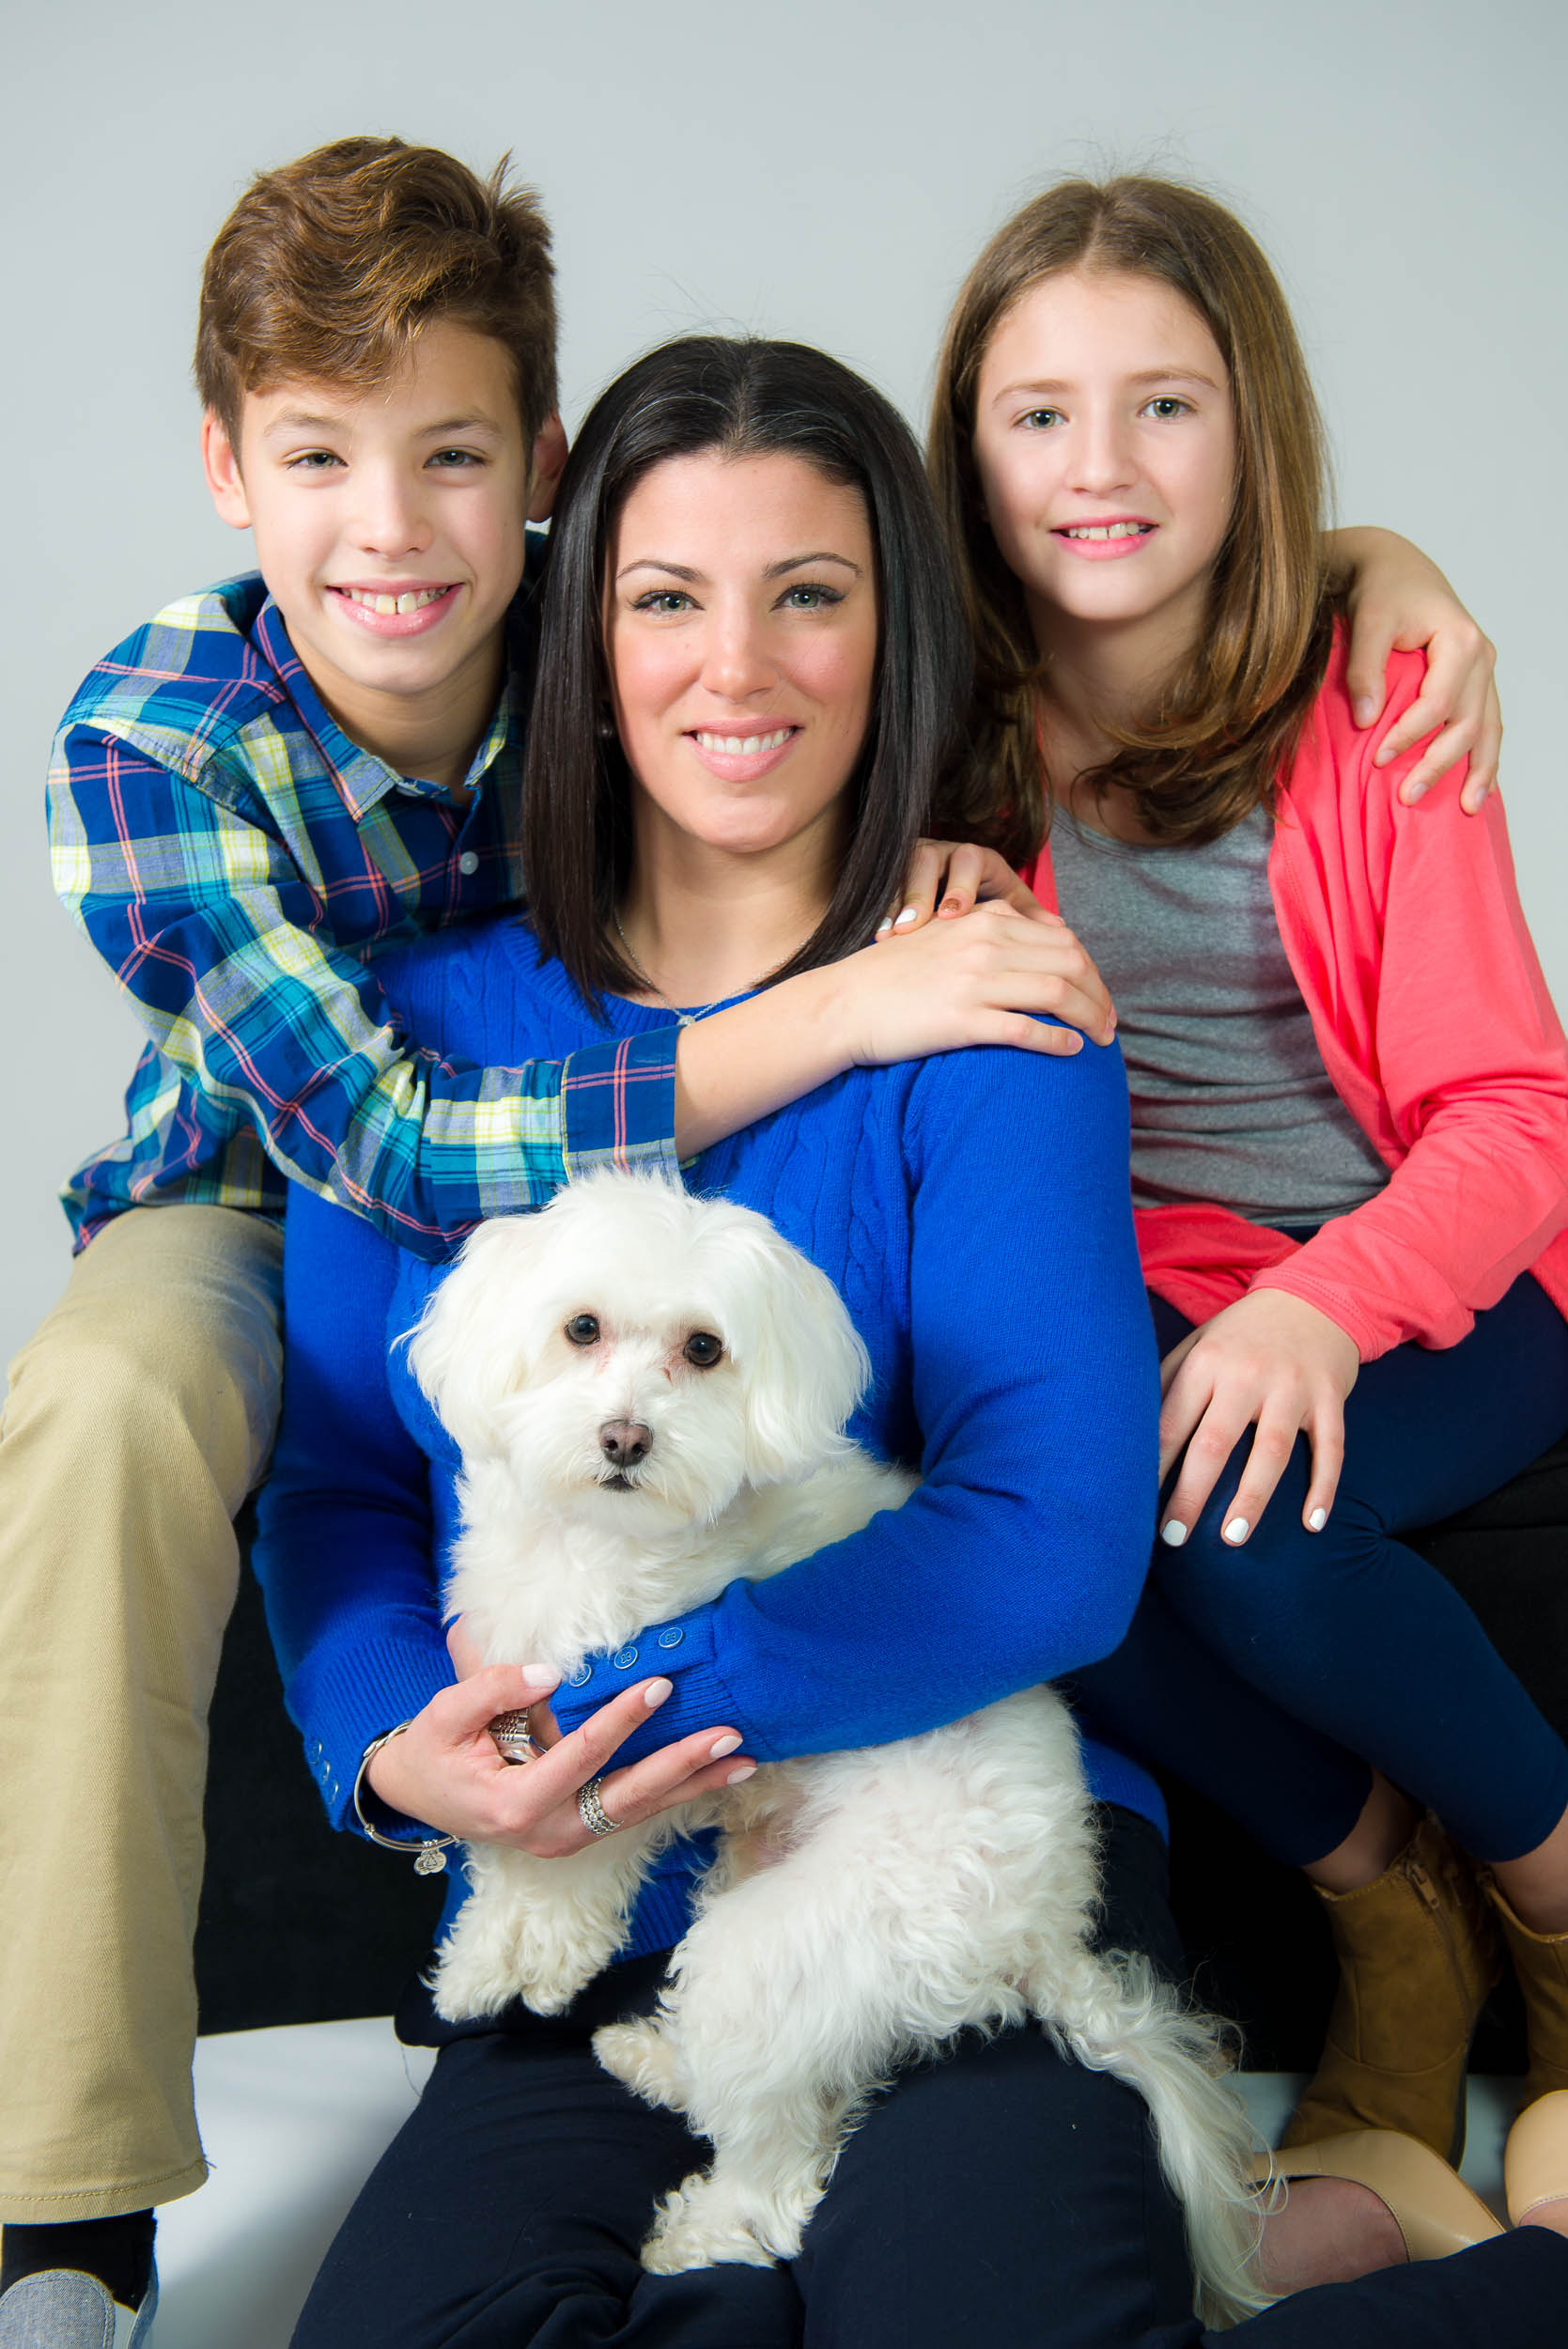 Dennis Soans Photography Family Group Portrait Fairfax VA